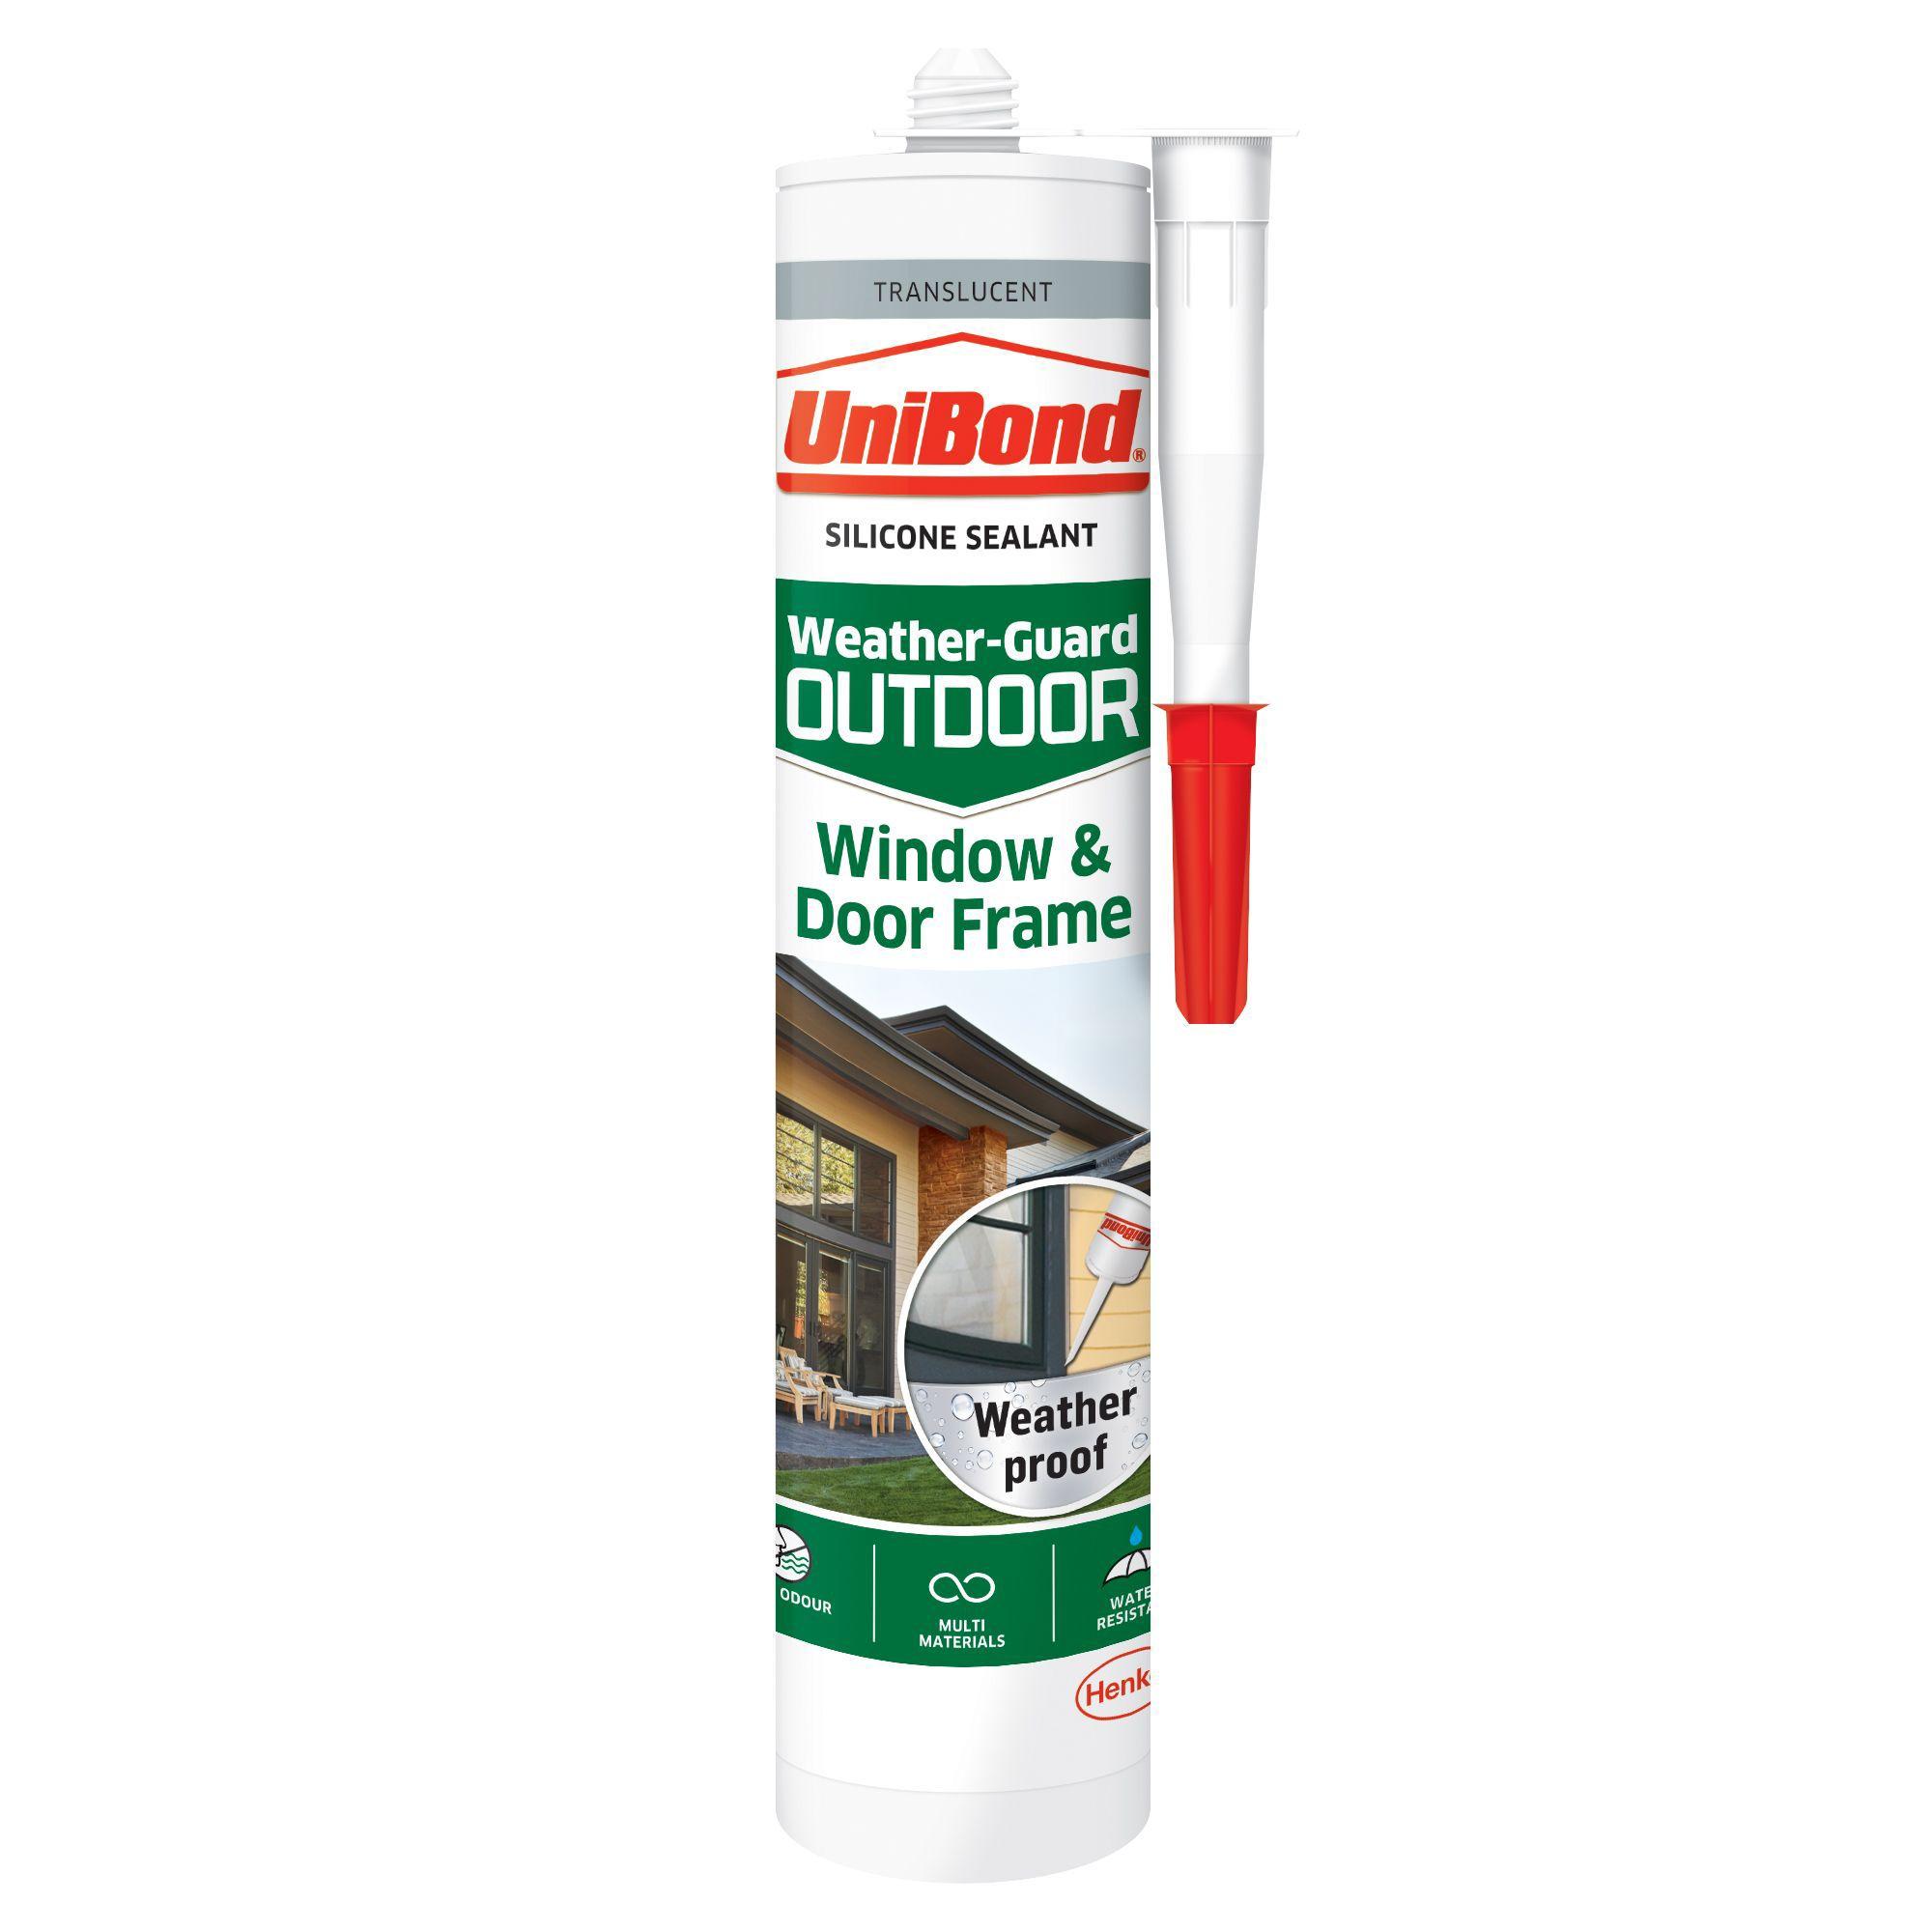 Unibond Weather Guard Outdoor Translucent Frame Sealant